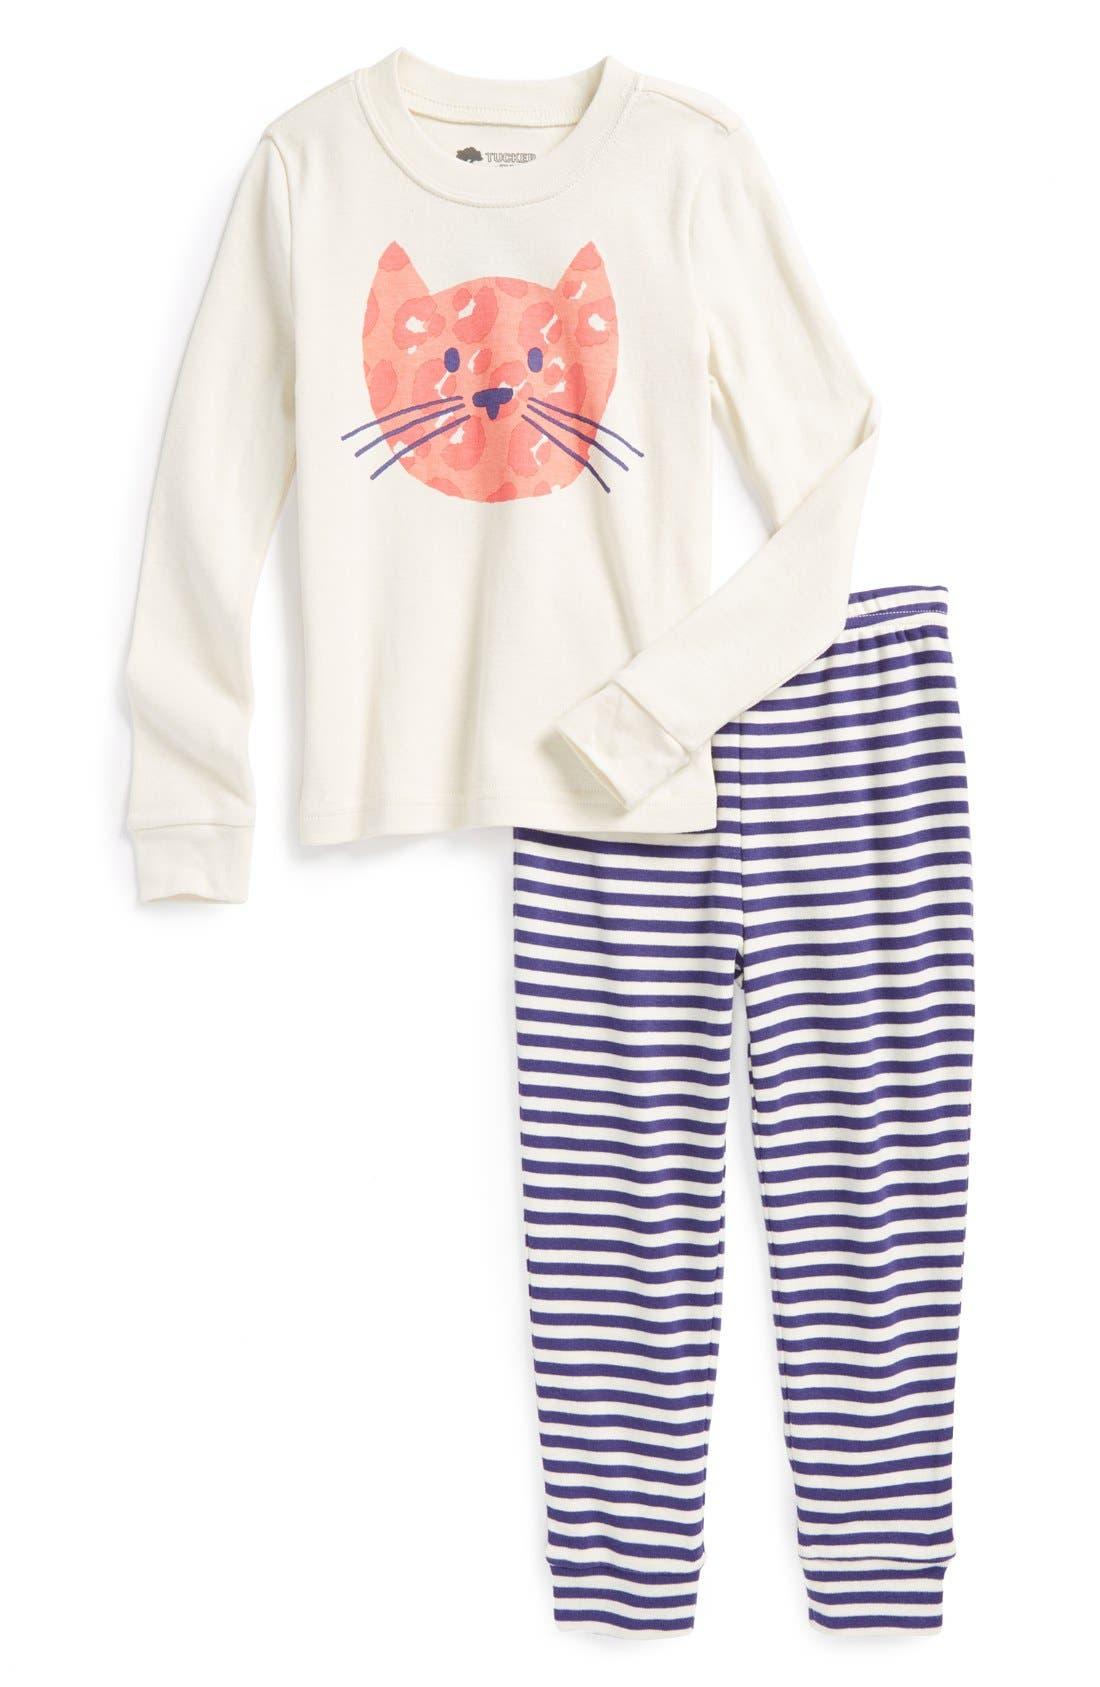 Alternate Image 1 Selected - Tucker + Tate Fitted Pajamas (Toddler Girls)